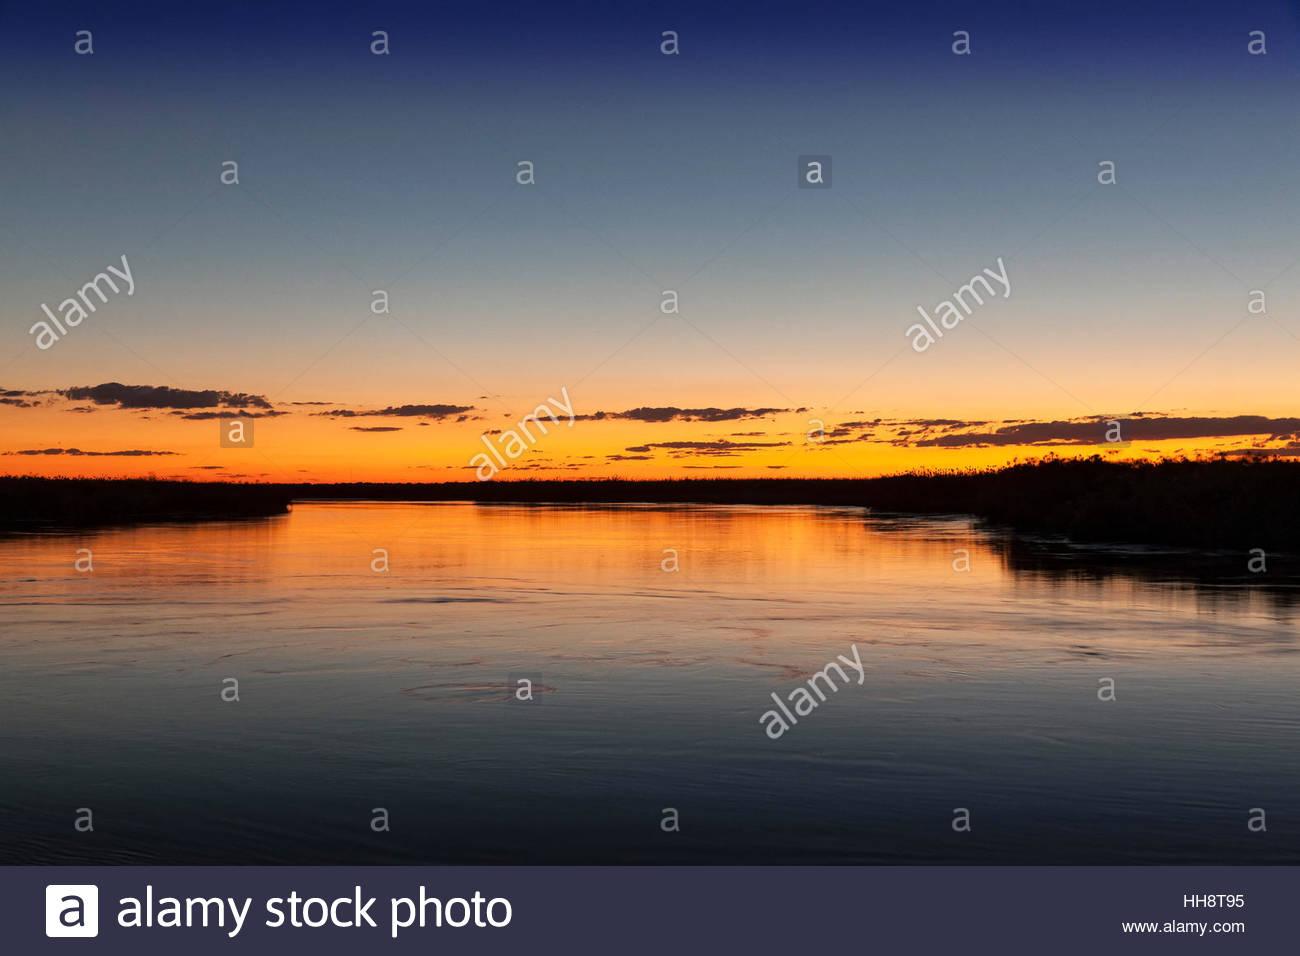 Sunset, Okavango River, Botswana - Stock Image